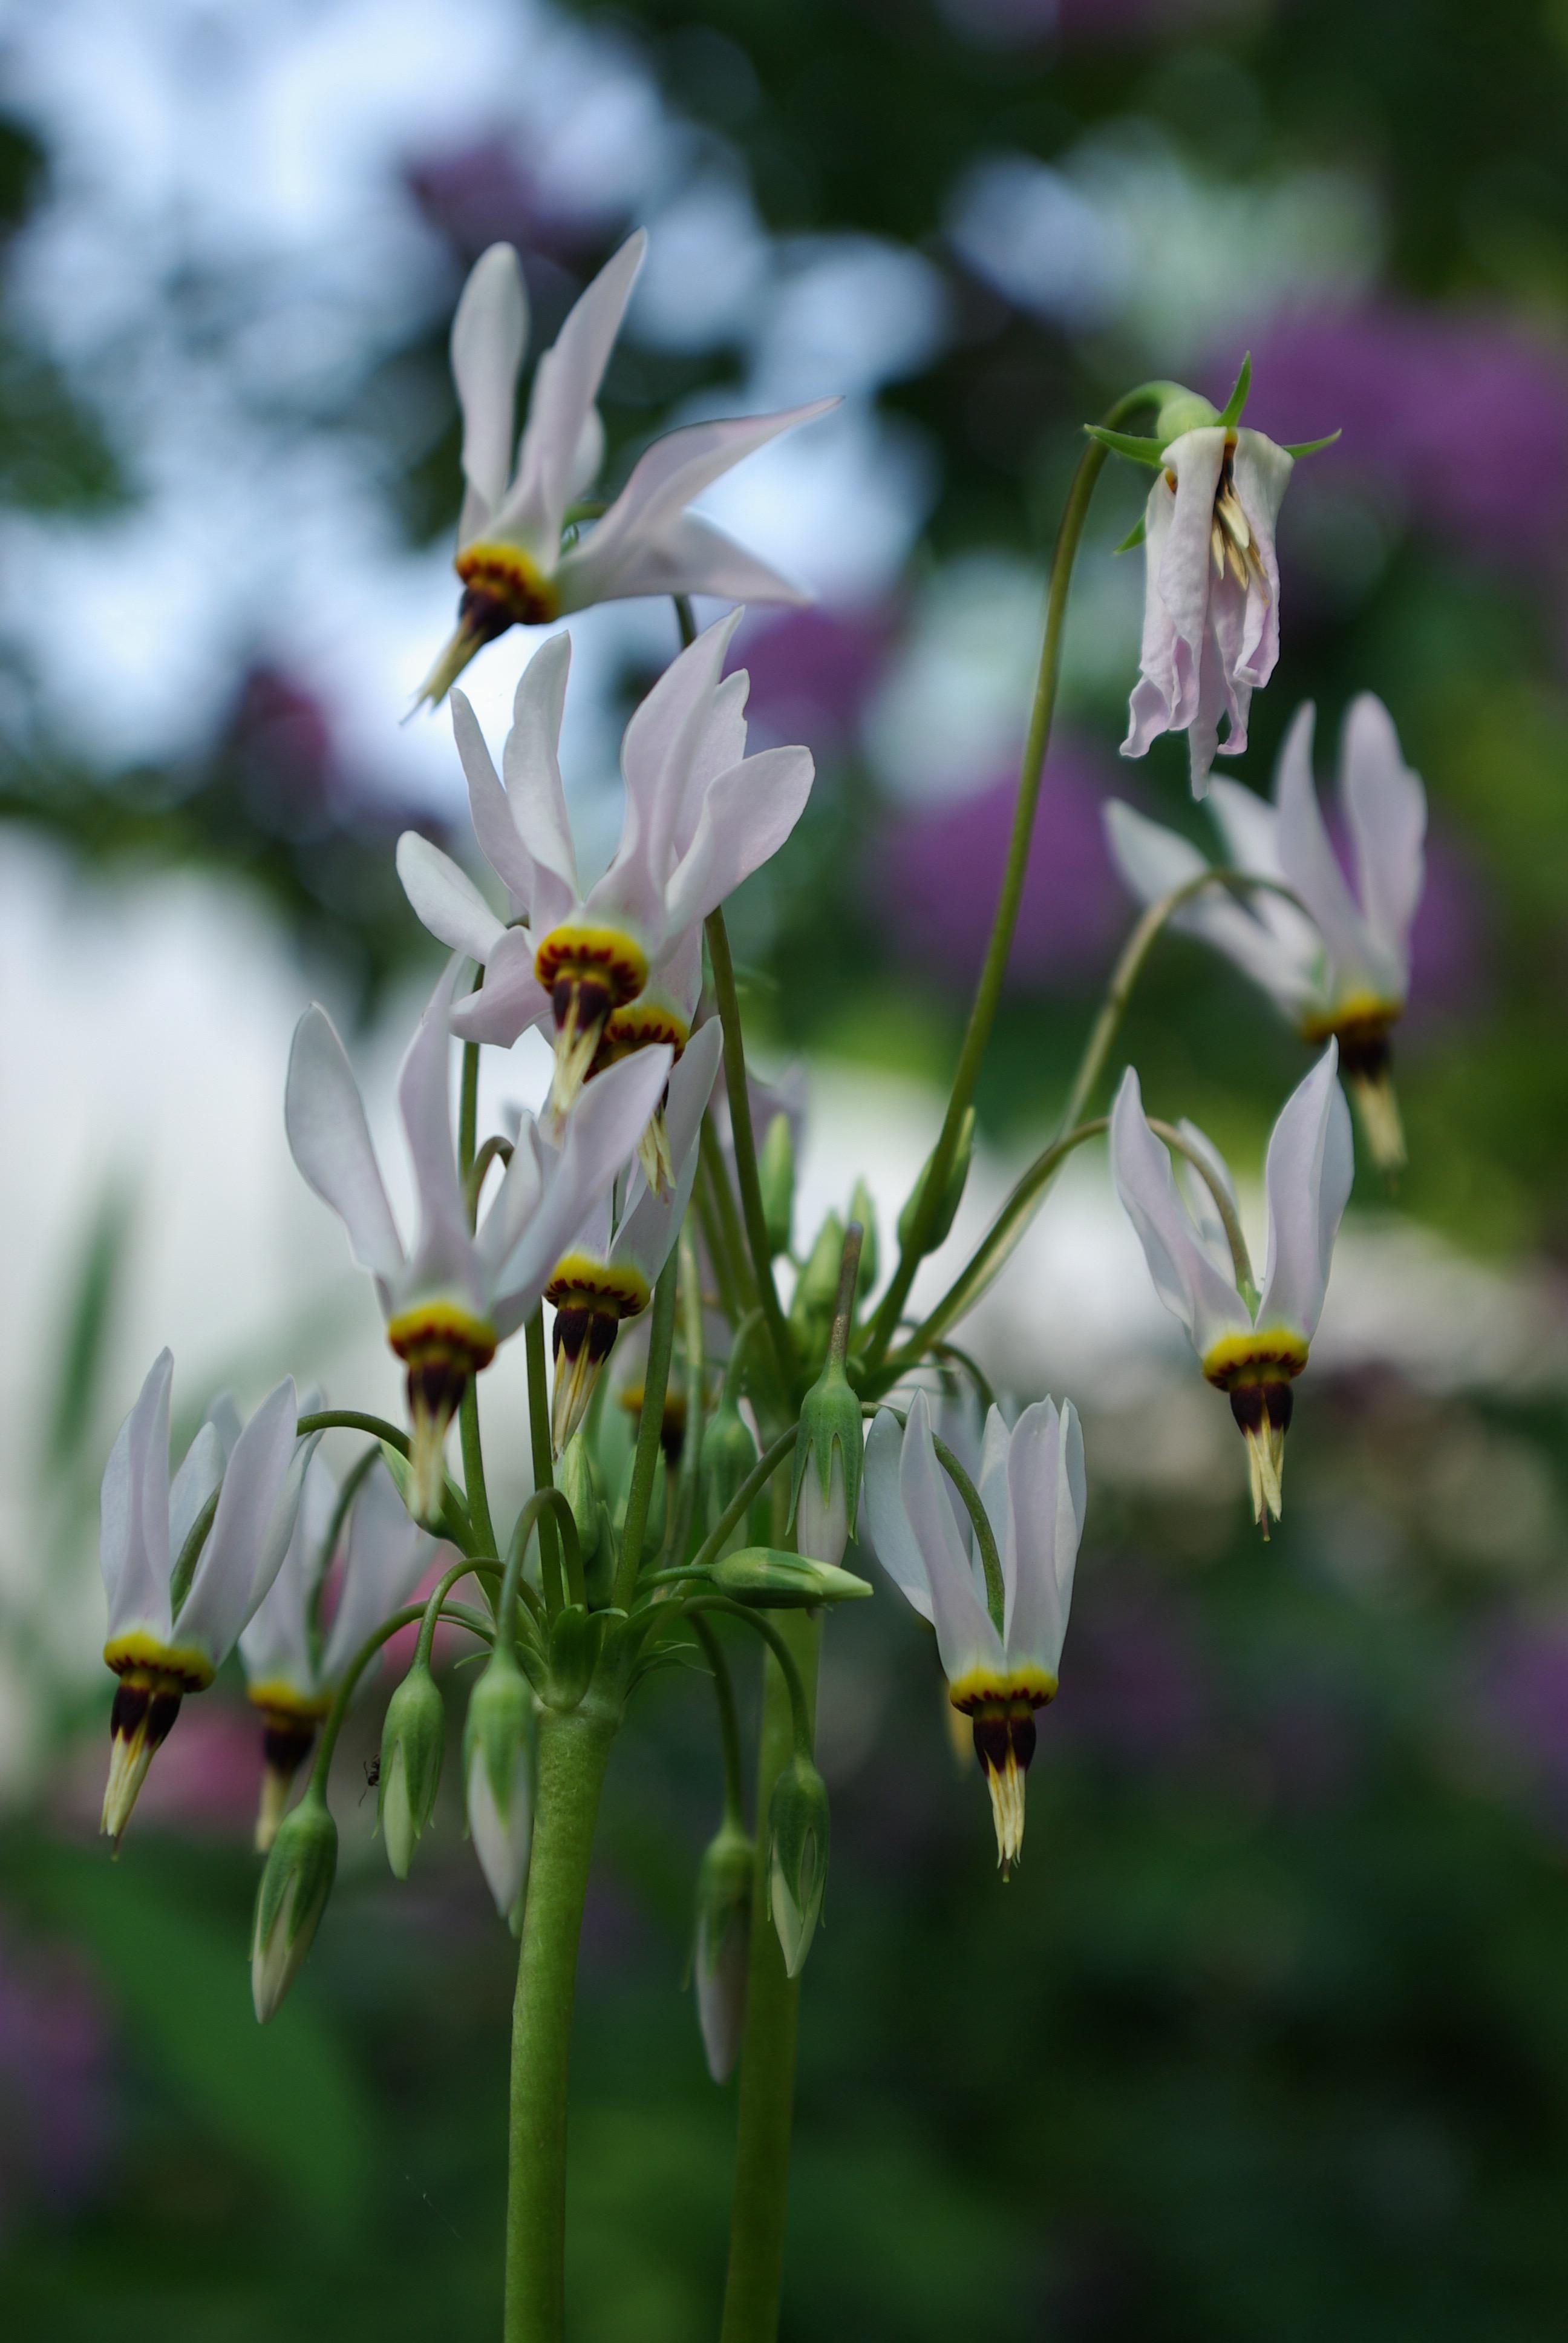 Svendsen & Keller | Plant Sourcing